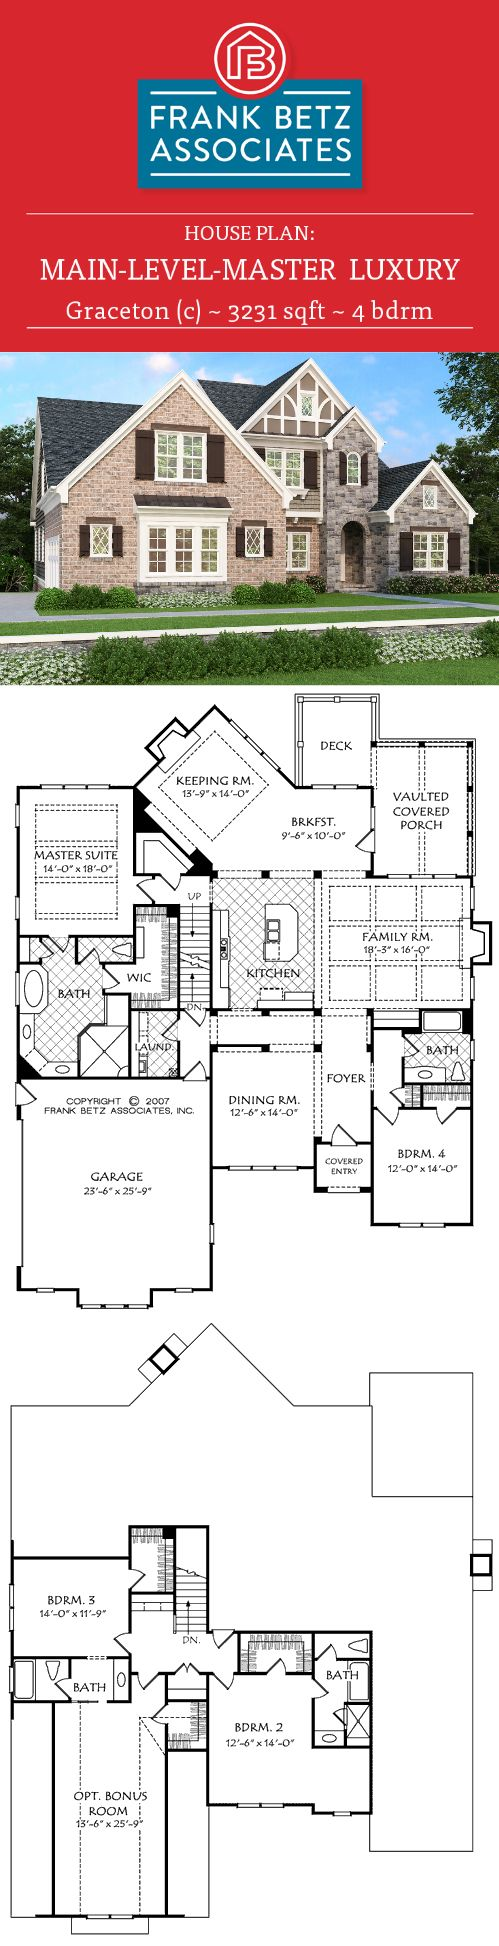 Best LUXURY HOUSE PLANS Images On Pinterest Luxury Houses - Design luxury house floor plans